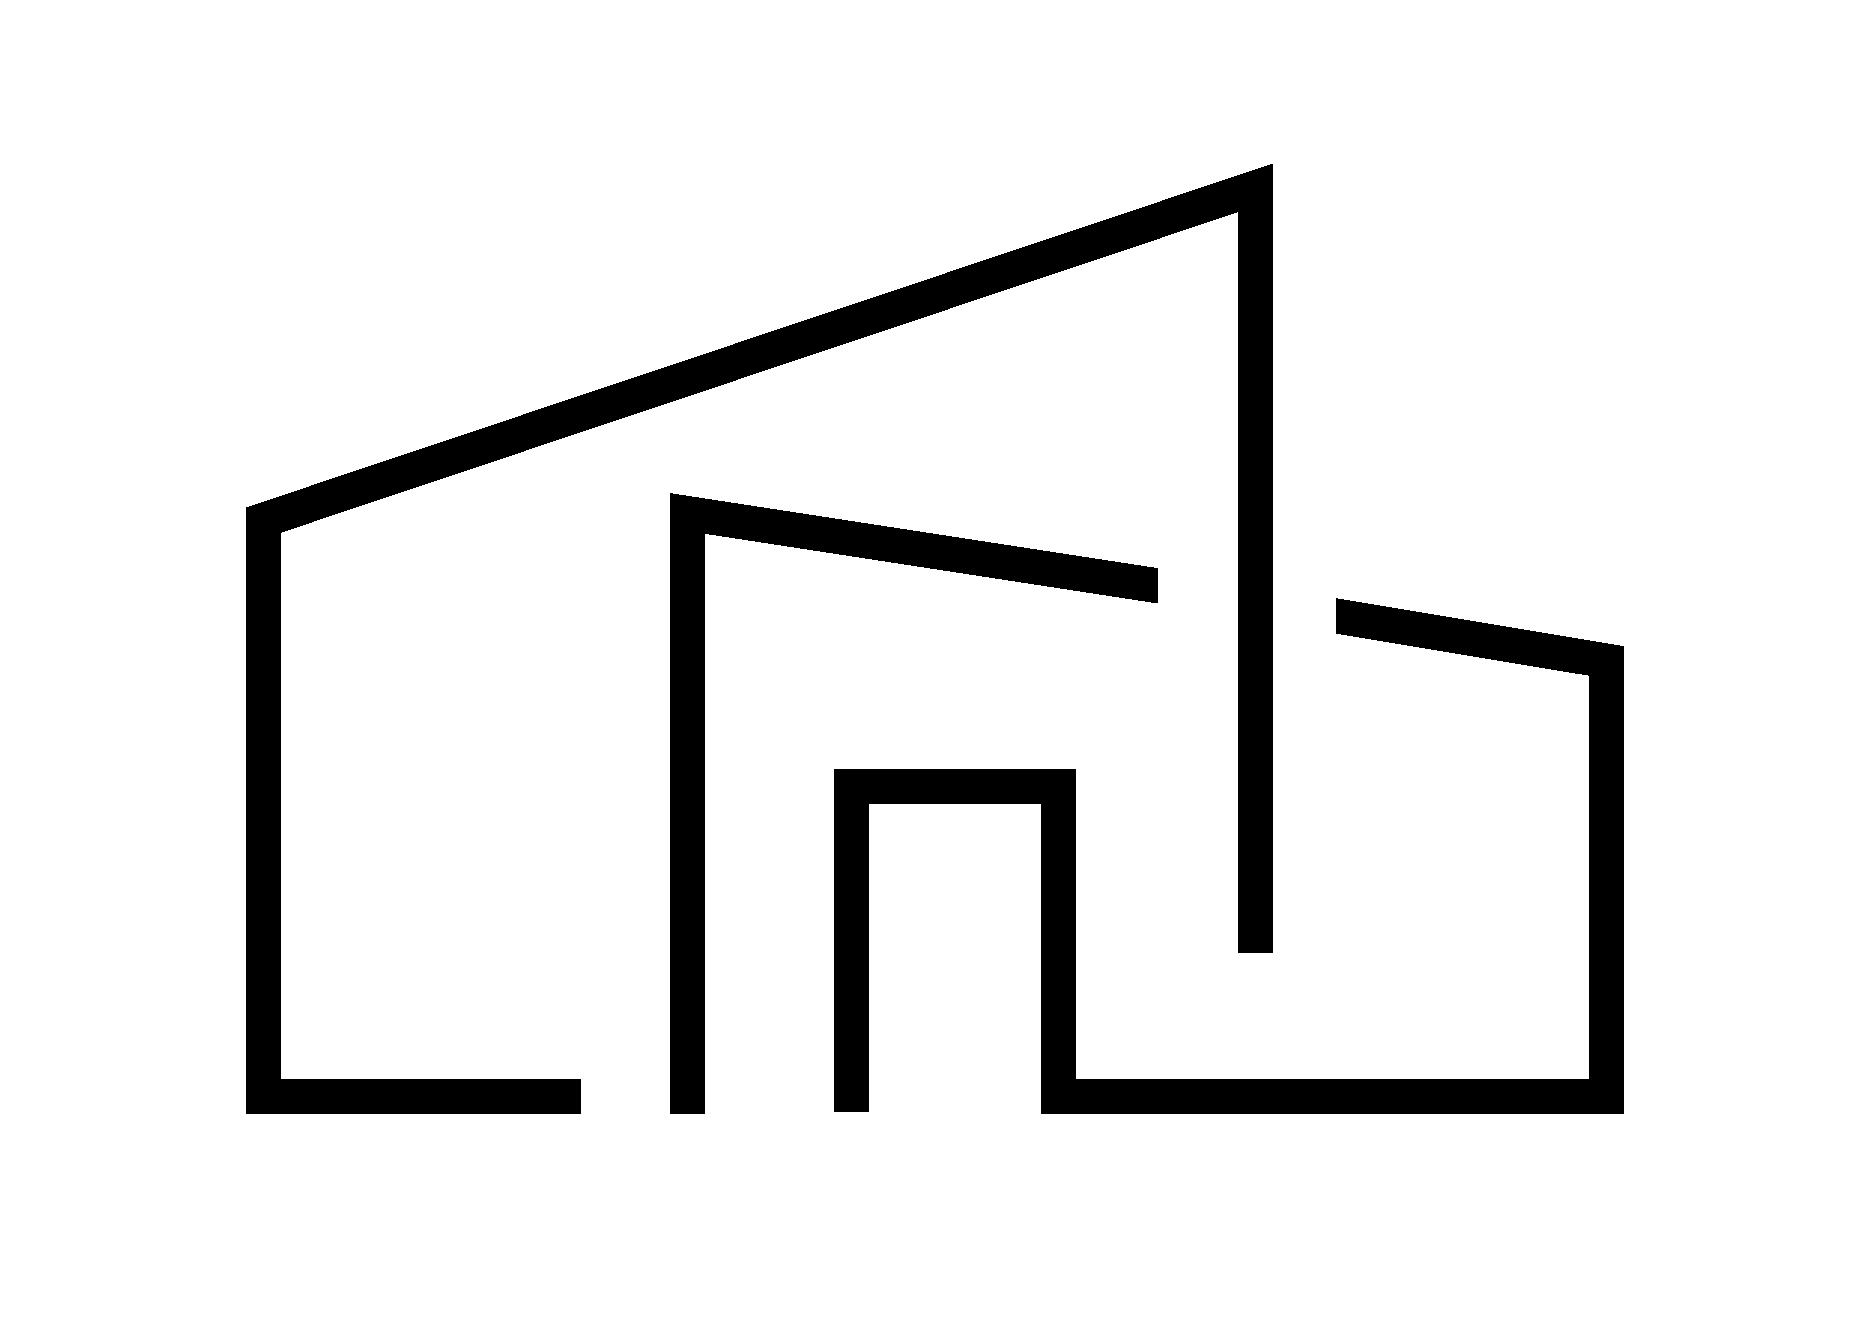 reside_worldwde_black_logo-01.png